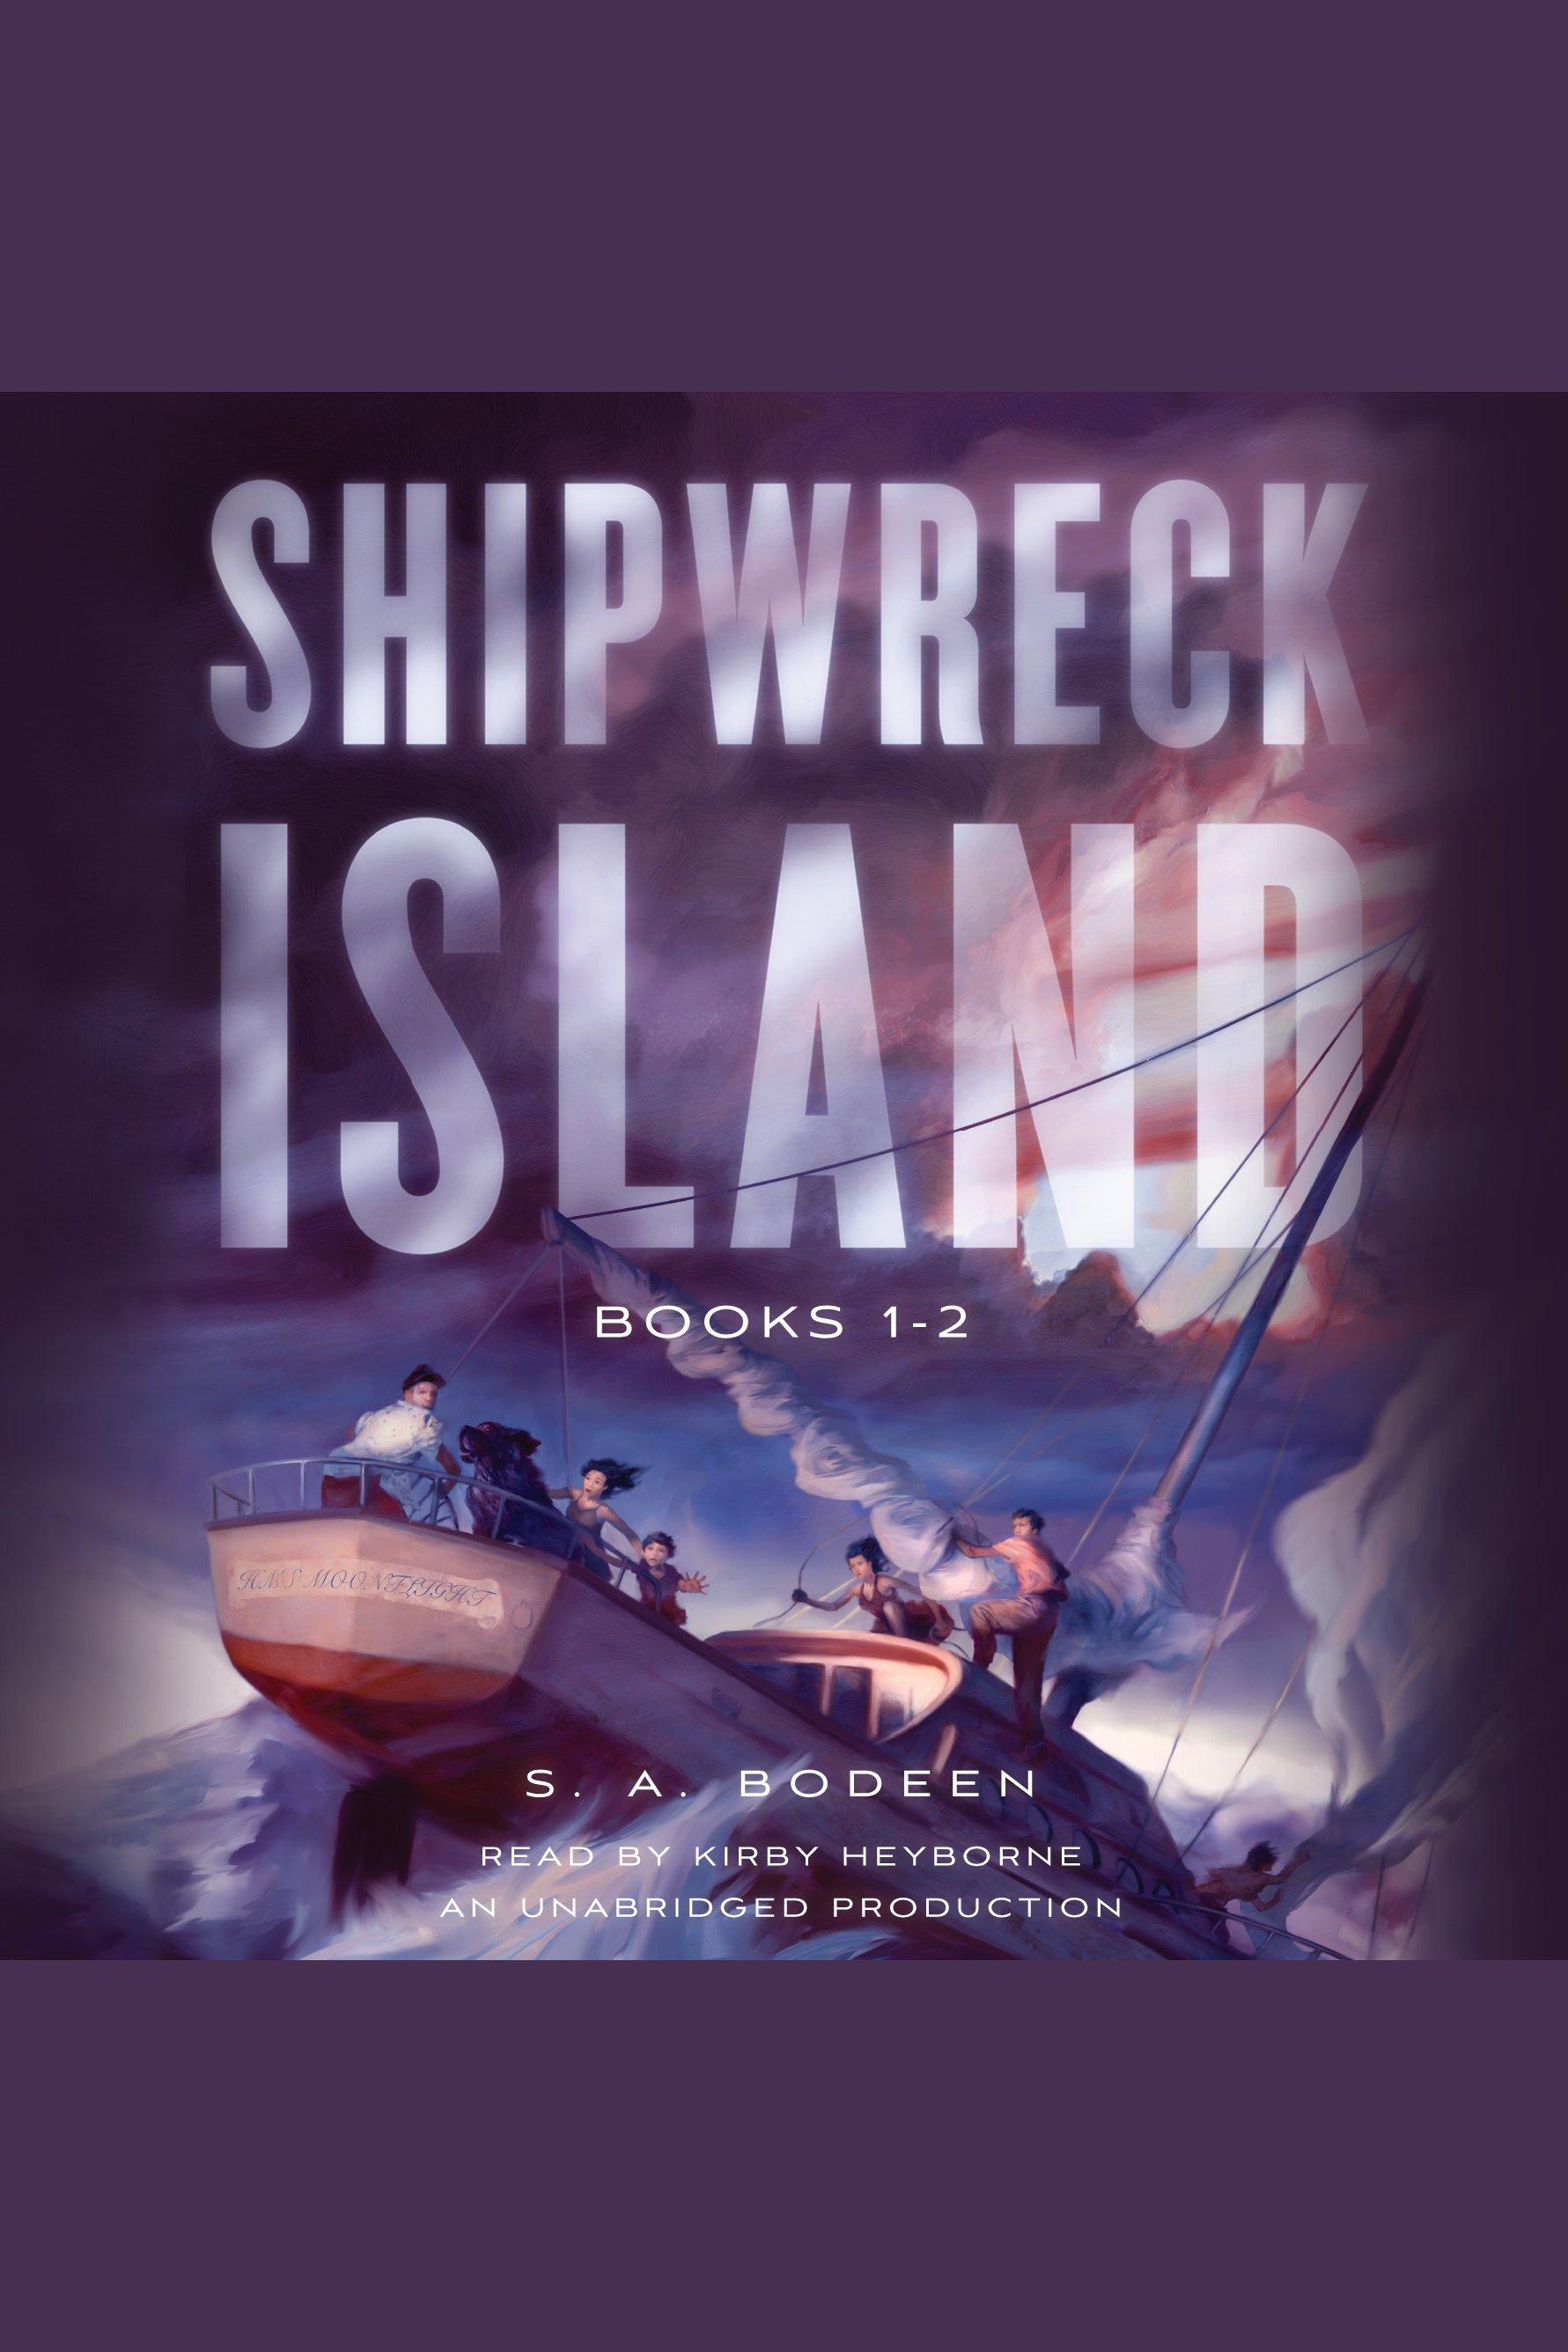 Shipwreck Island cover image